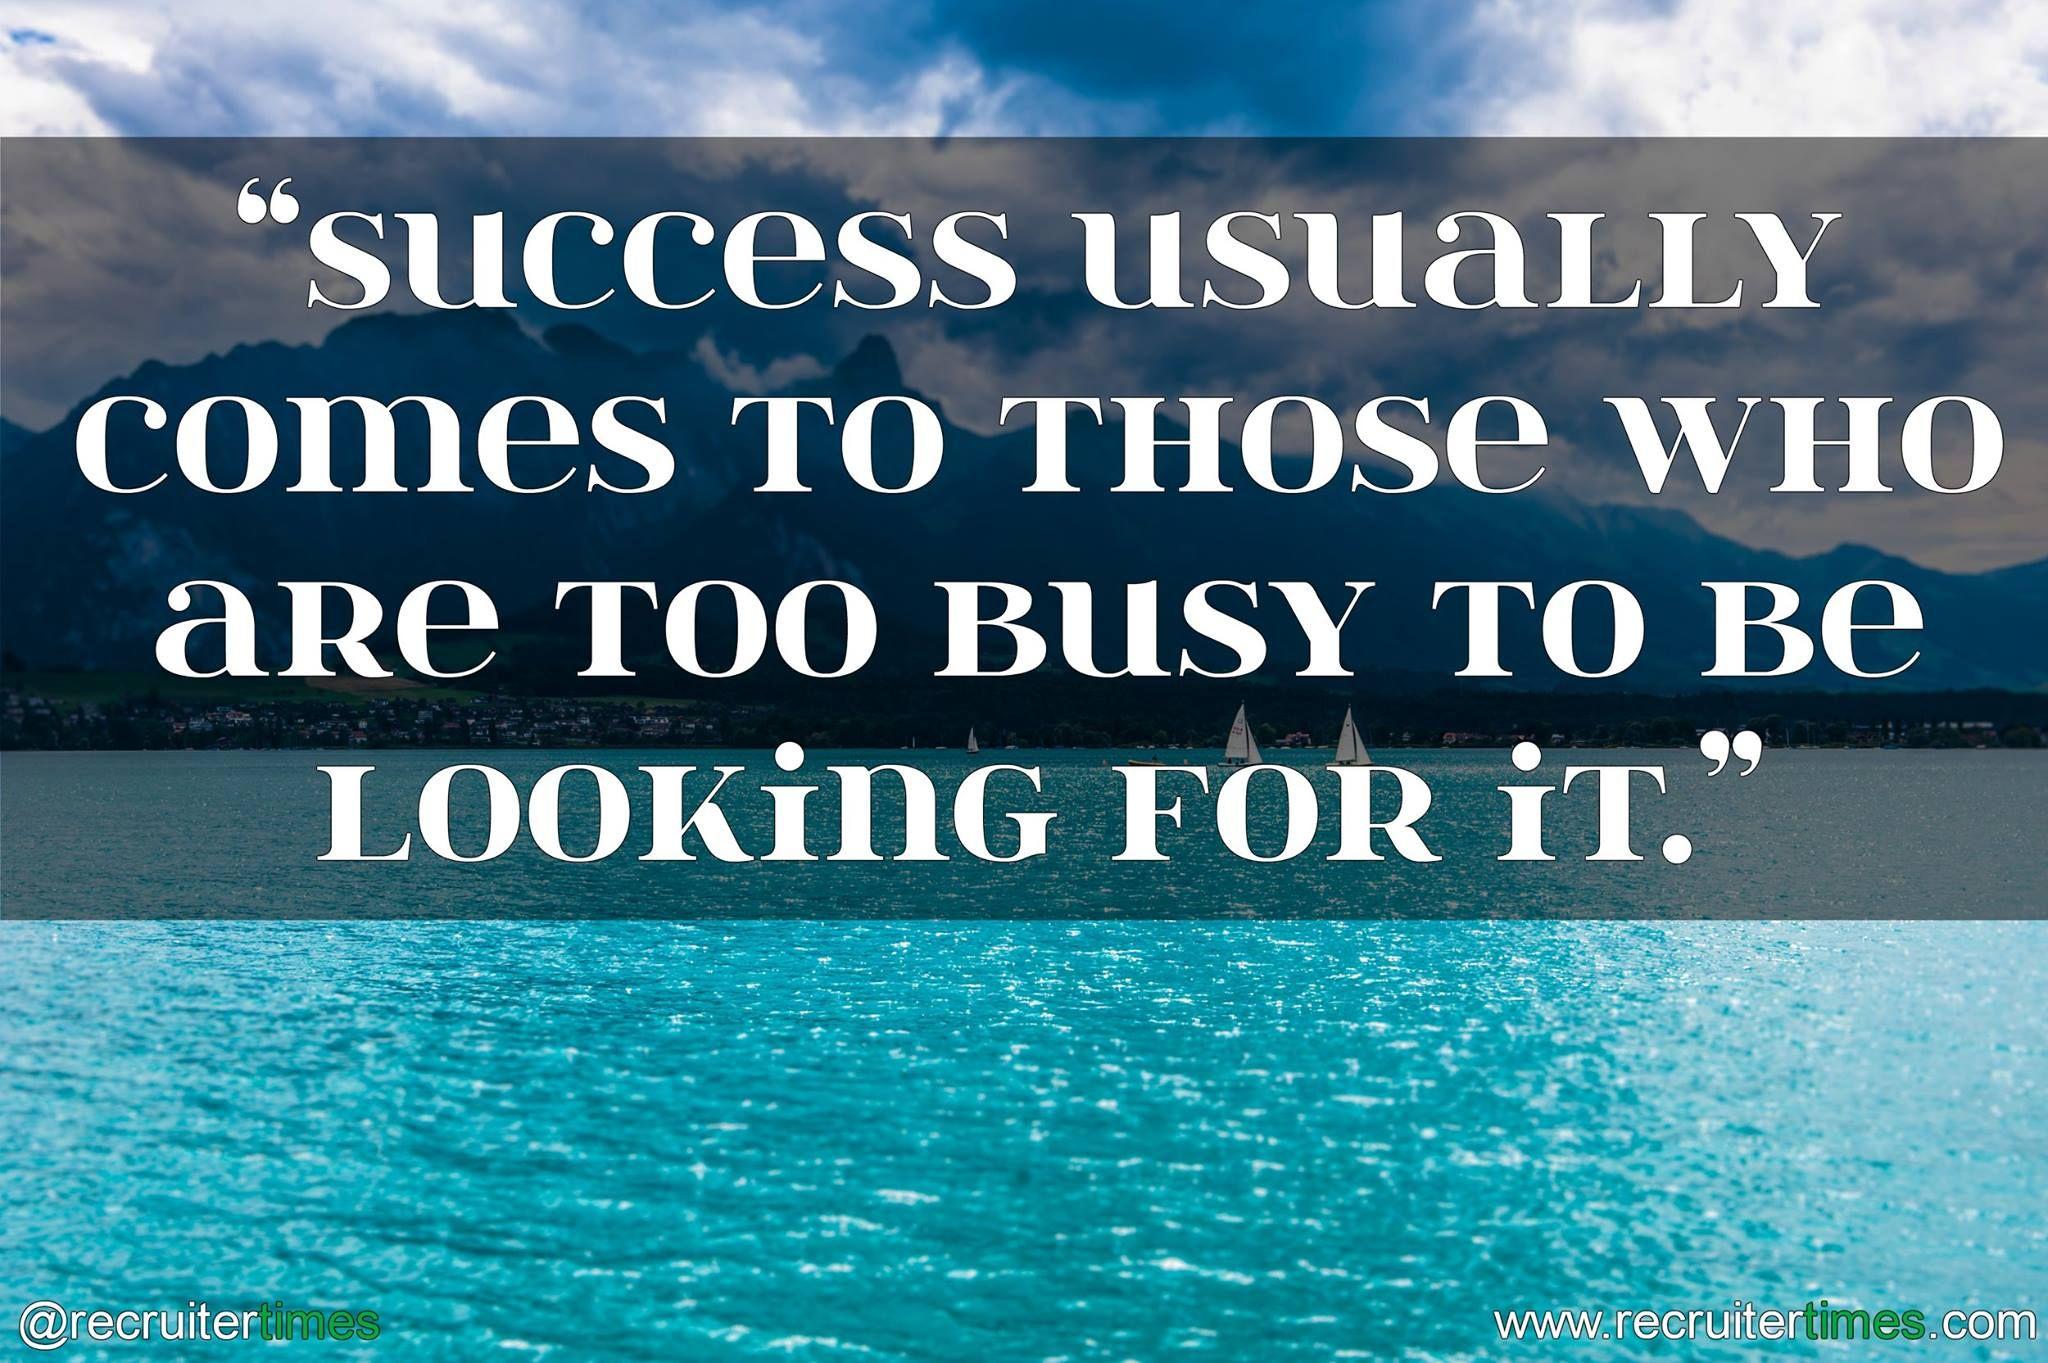 Ready to start a new week? Here is a lift! #recruitment #hiringplug #recruitertimes #interviews #screening #management #talentacquisition #business #HR #quote